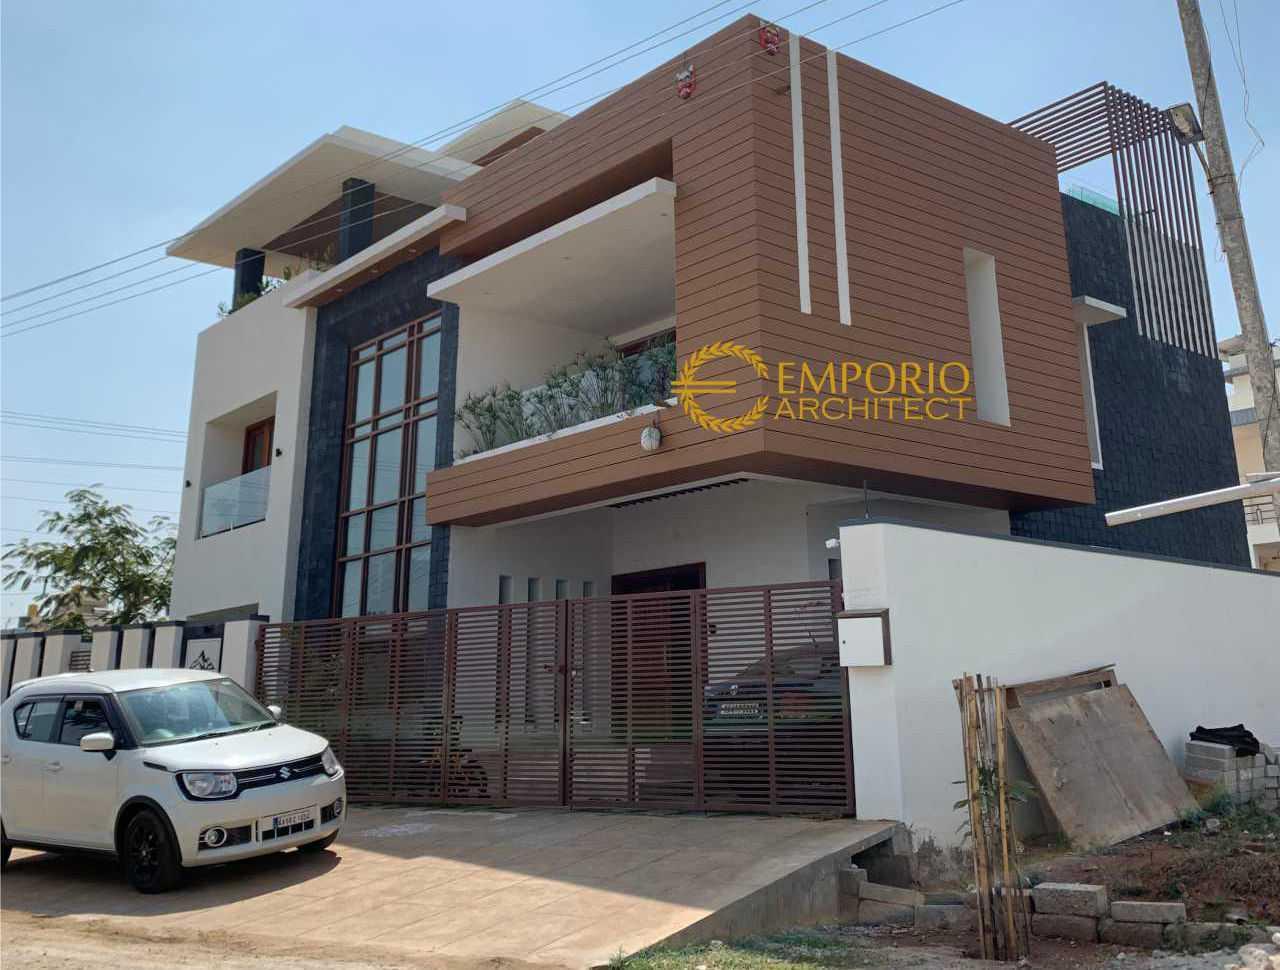 Emporio Architect Jasa Arsitek India Hasil Konstruksi Rumah Modern Tropis 422 @ Banglore, India Bengaluru, Karnataka, India Bengaluru, Karnataka, India Emporio-Architect-Jasa-Arsitek-India-Hasil-Konstruksi-Rumah-Modern-Tropis-422-Banglore-India  85853